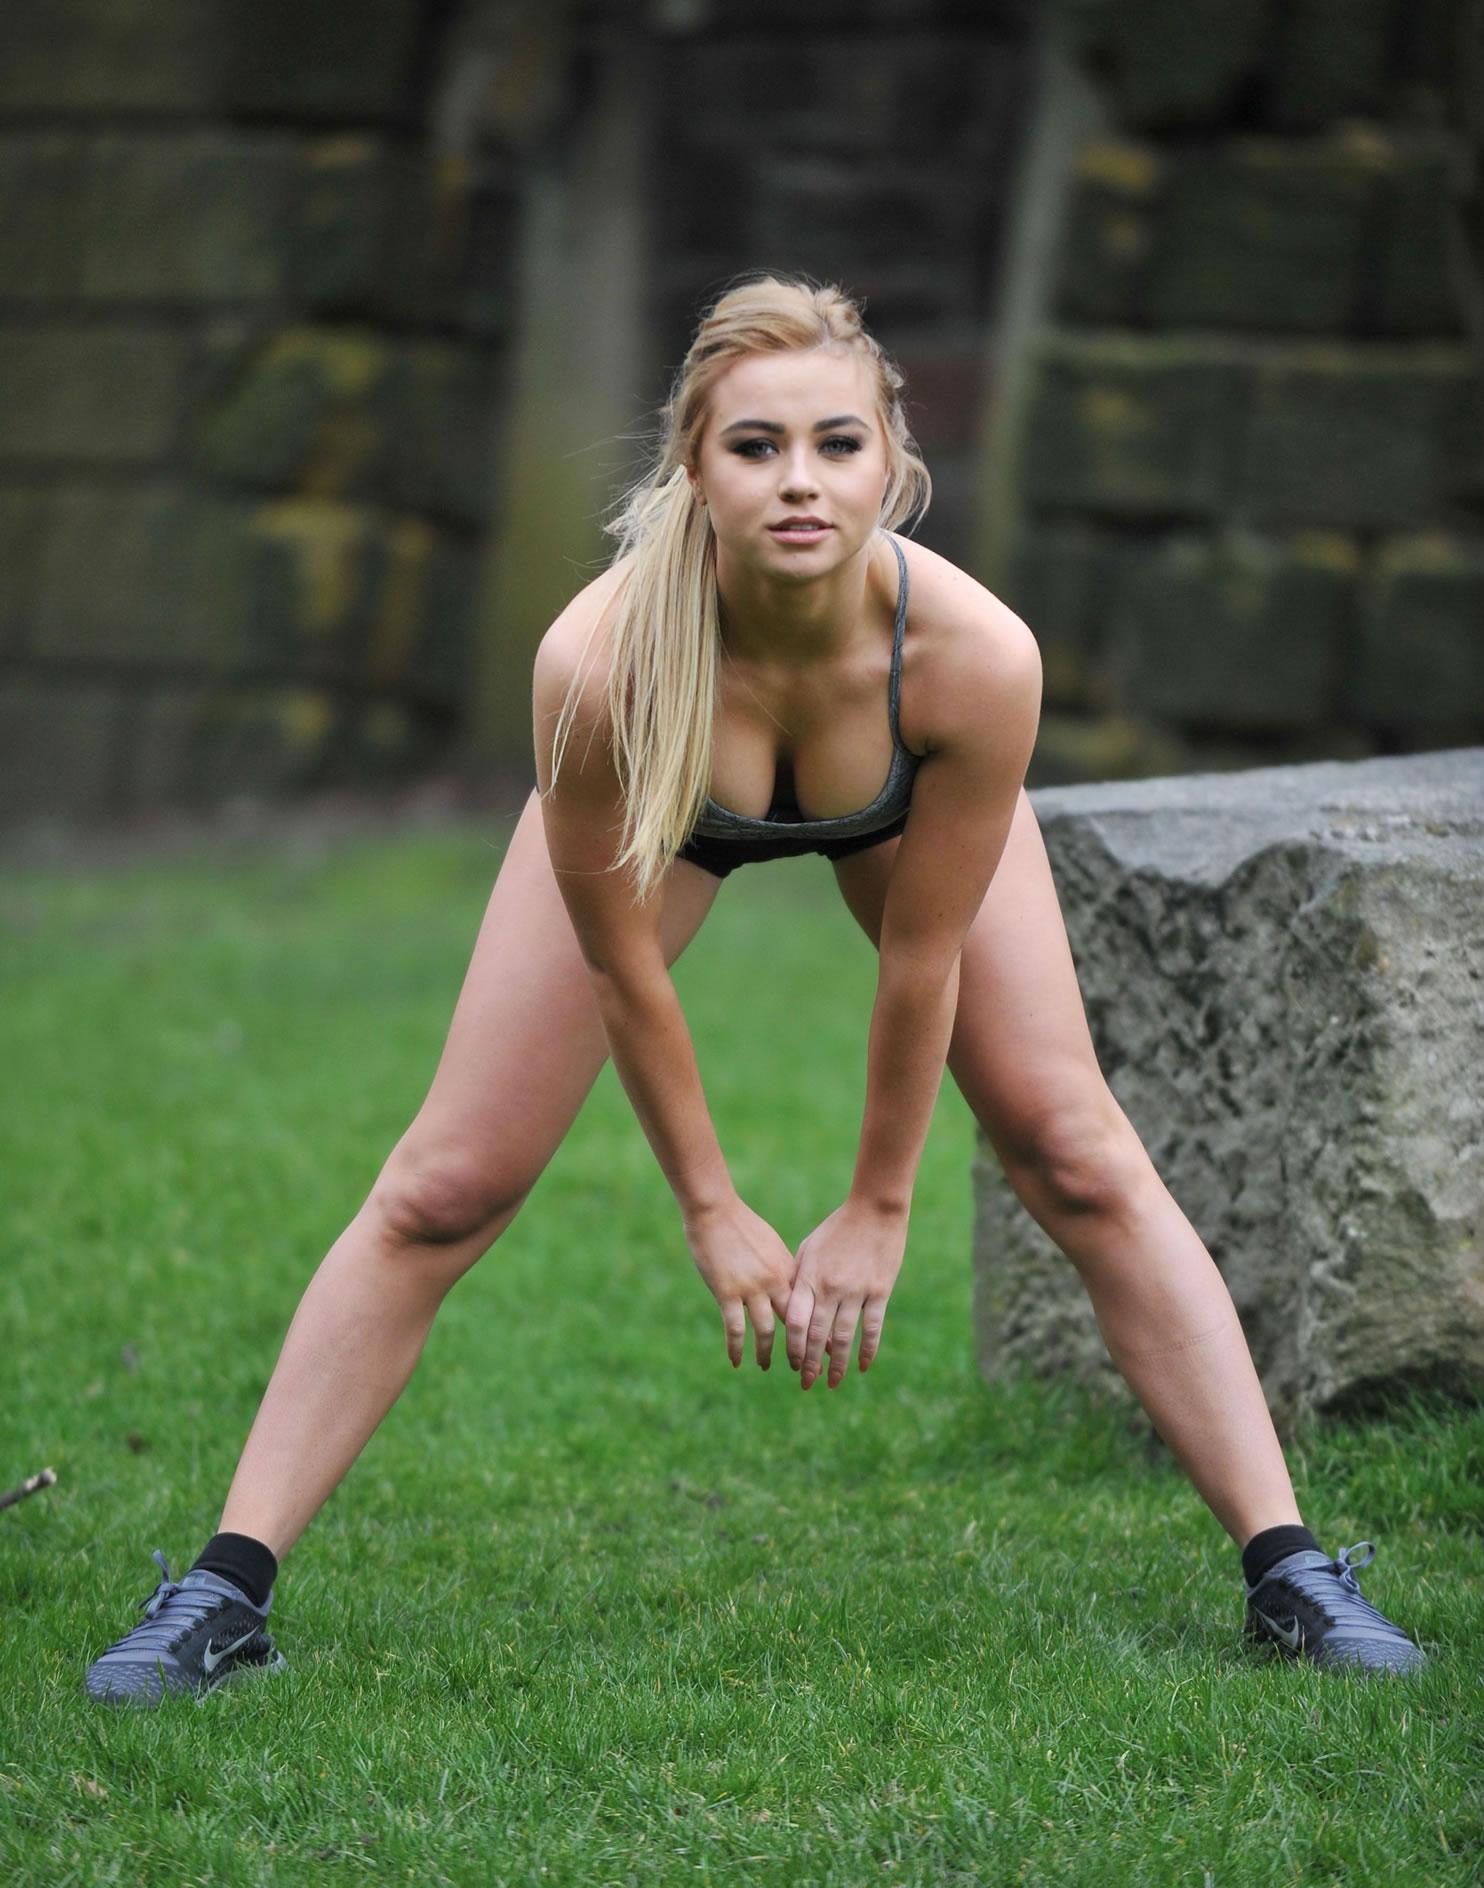 Melissa Reeves Half Nude Bending Over